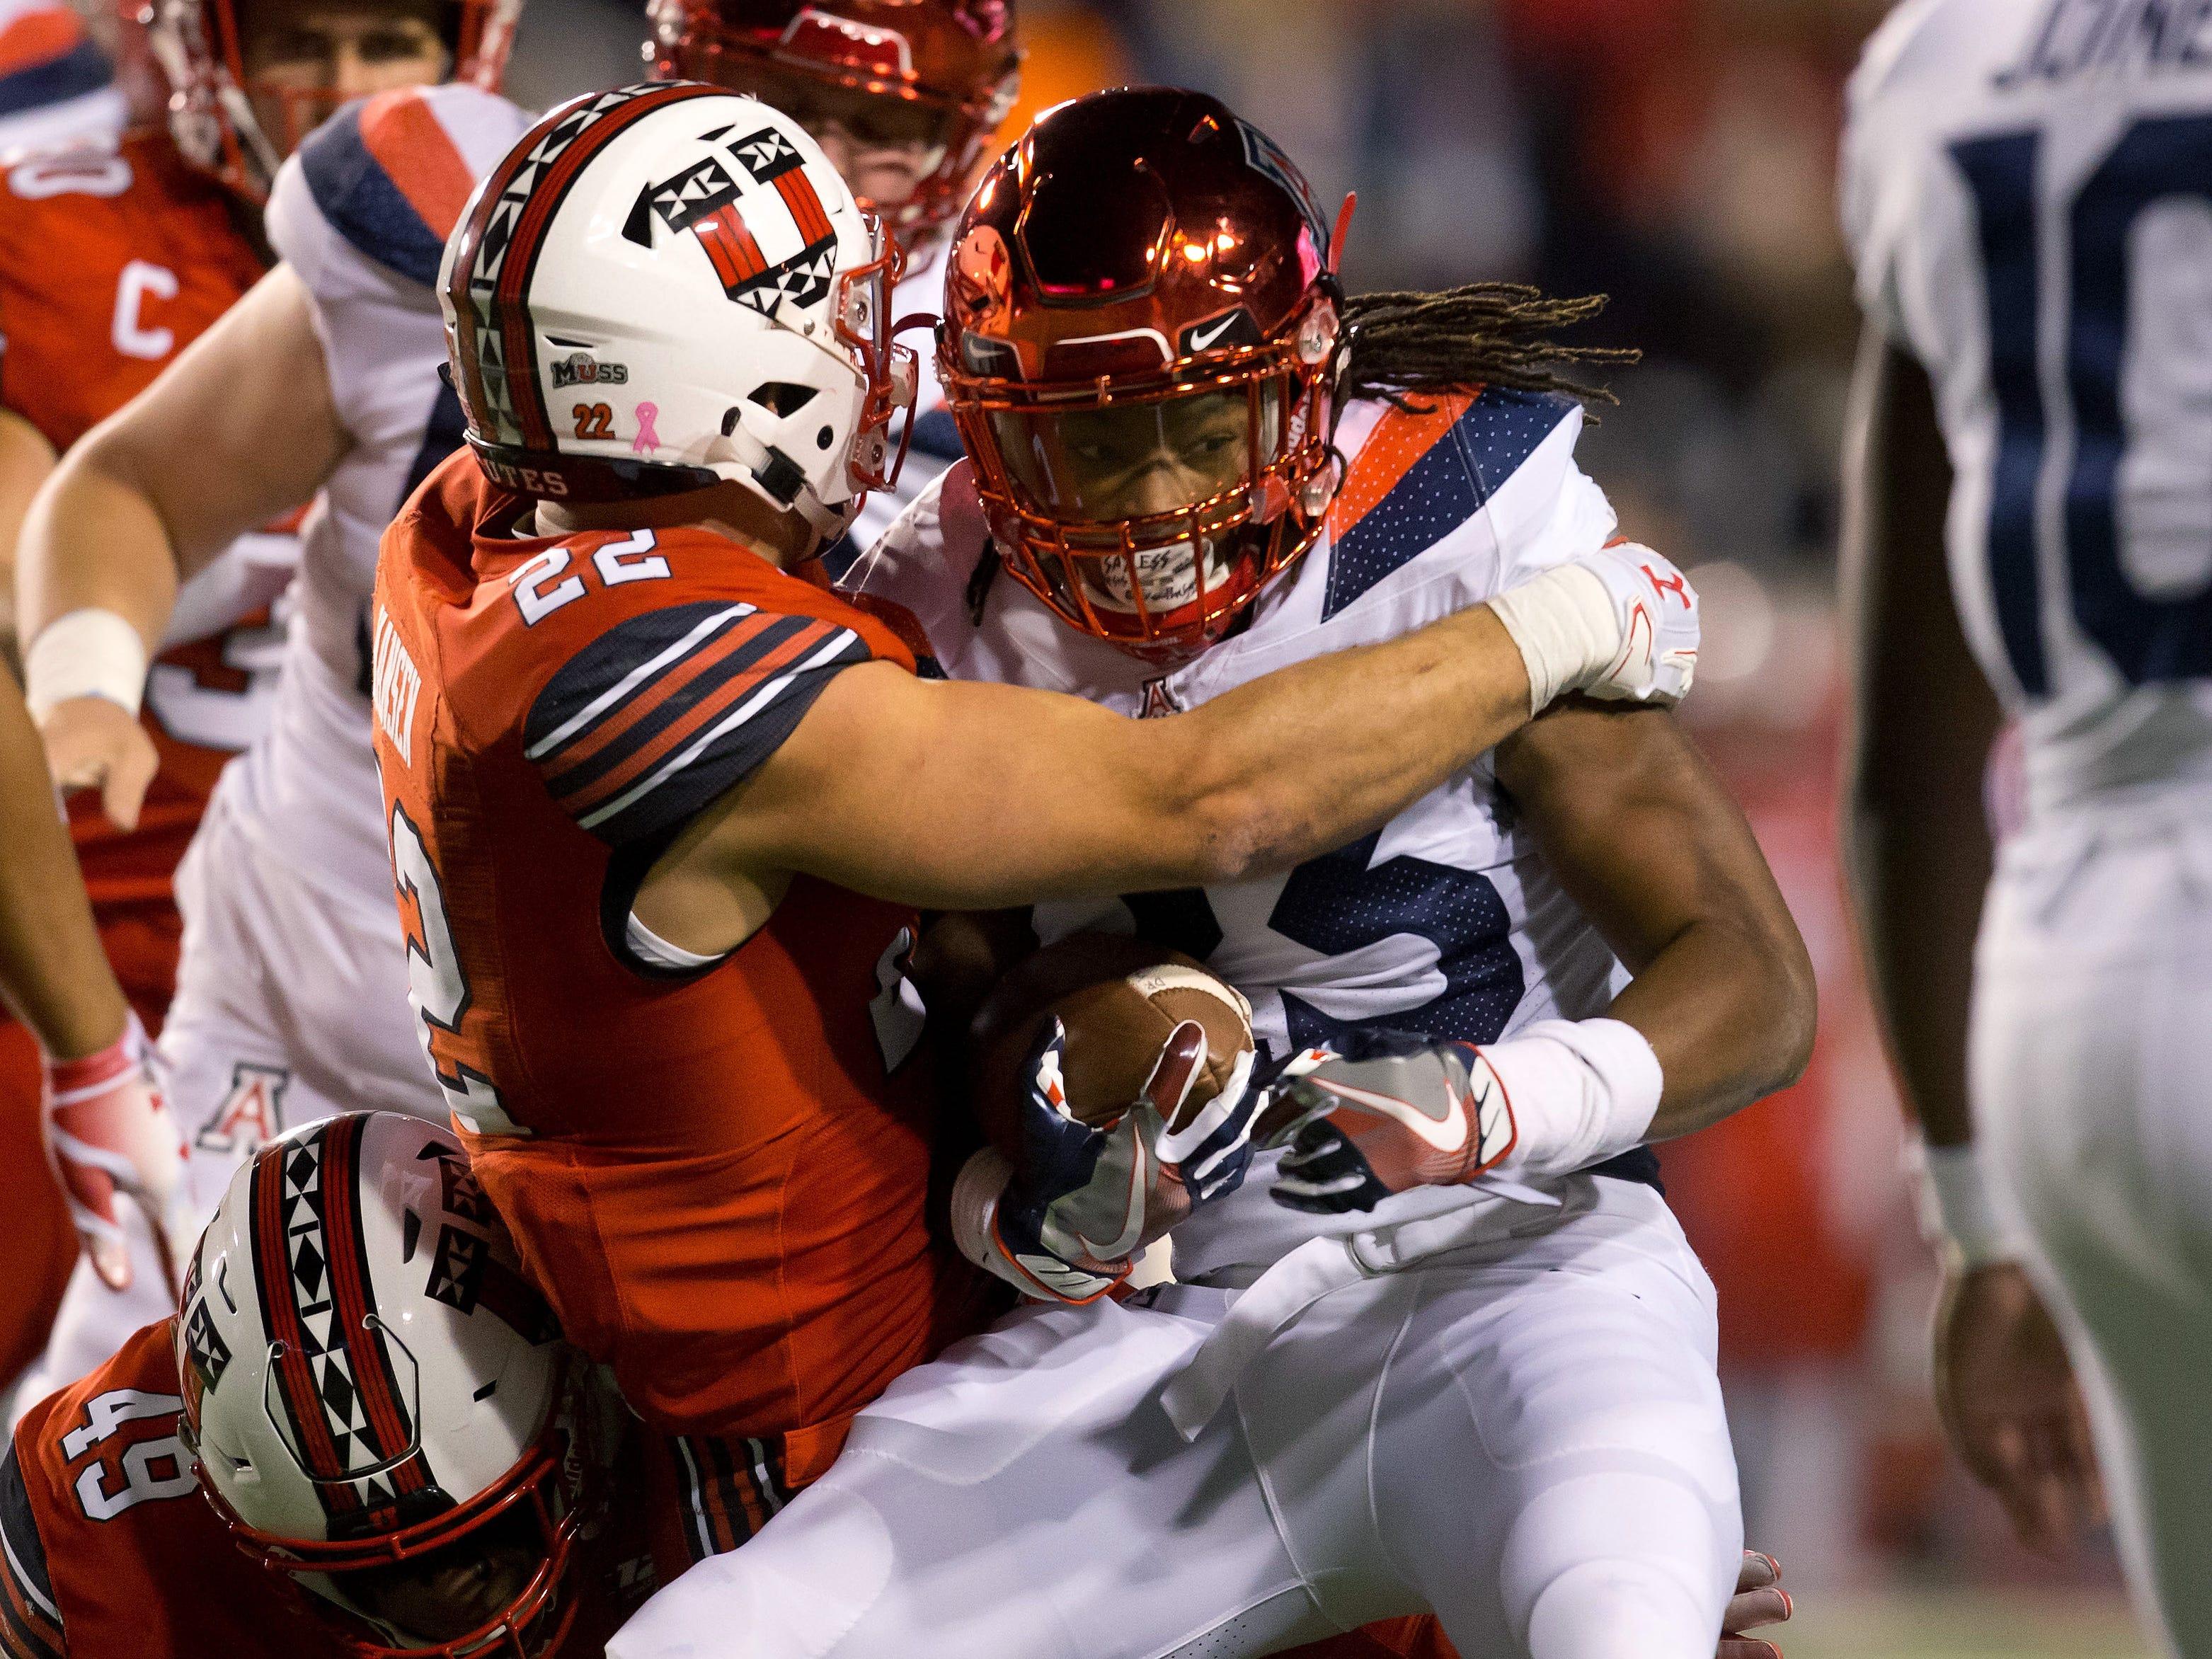 Oct 12, 2018; Salt Lake City, UT, USA; Arizona Wildcats running back Gary Brightwell (23) is tackled by Utah Utes linebacker Chase Hansen (22) during the first half at Rice-Eccles Stadium.